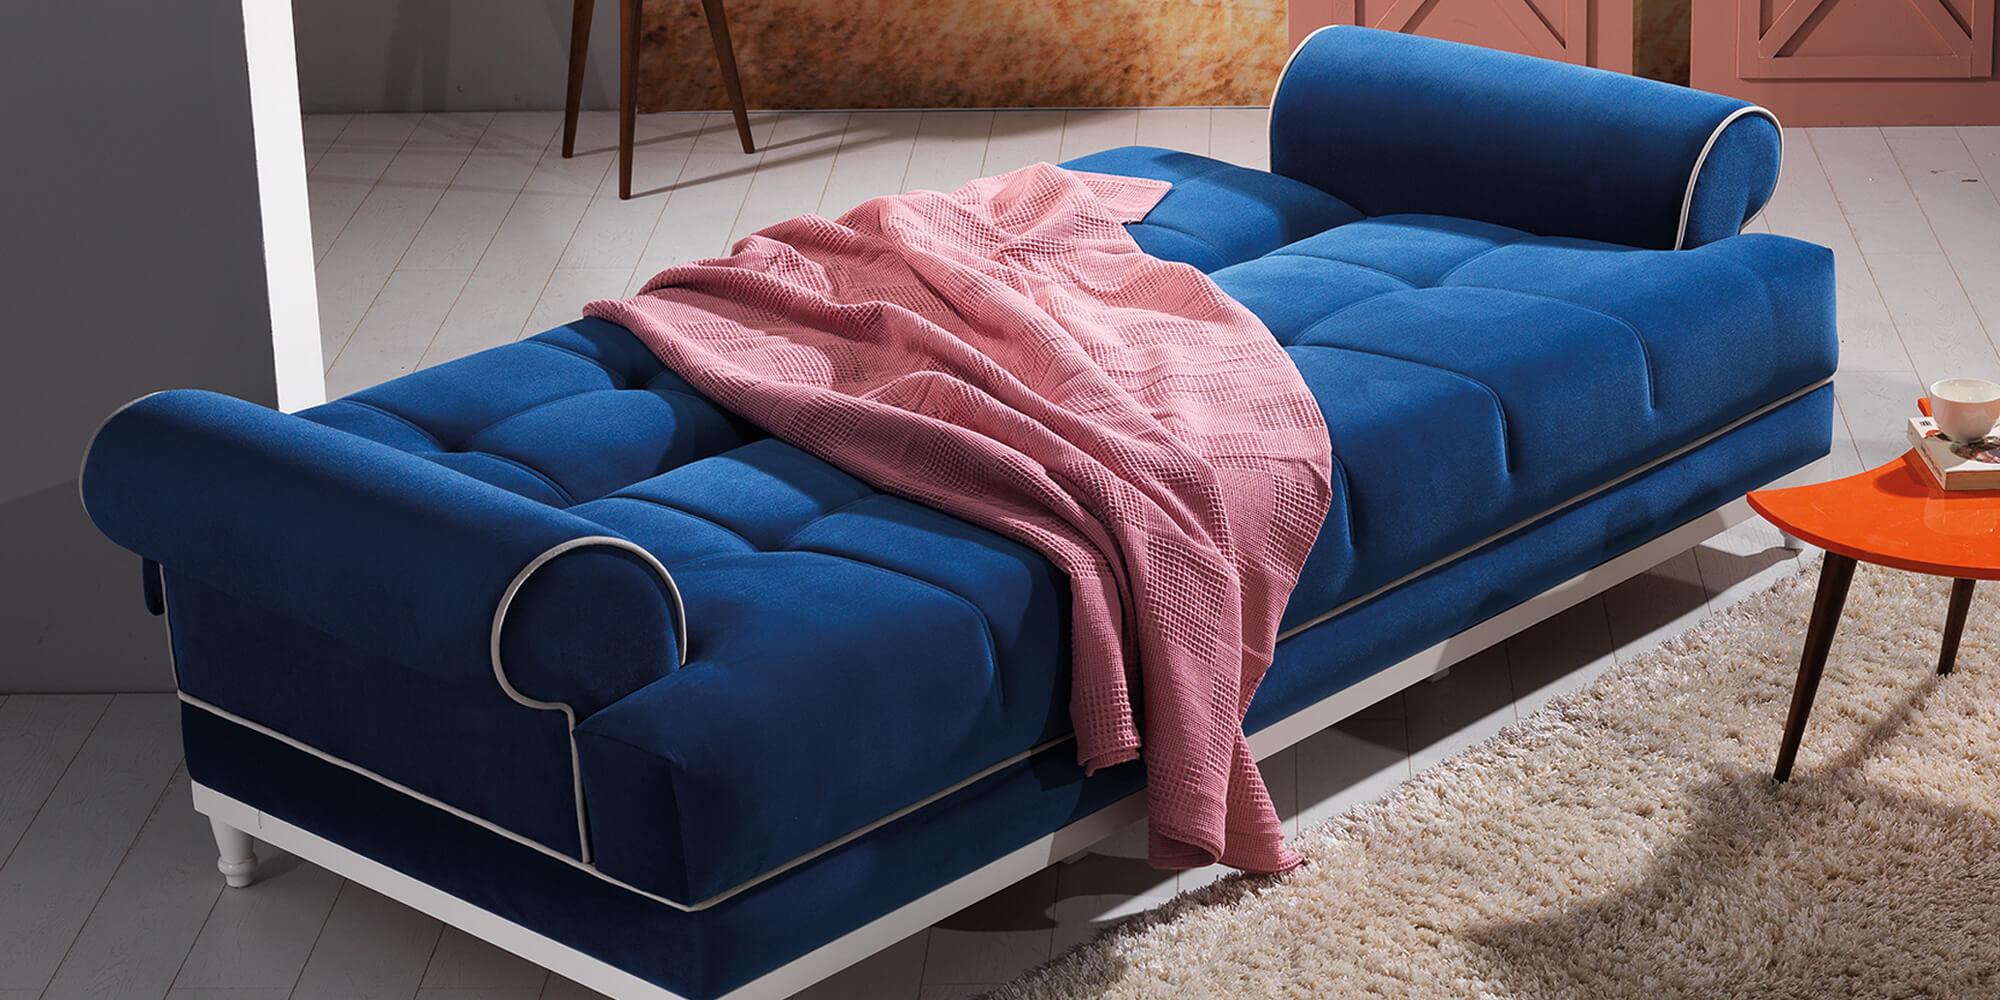 New Zen 3+2+1 Delux Sofa Set – Yuvam Möbelhaus in Wuppertal | Cilek ...